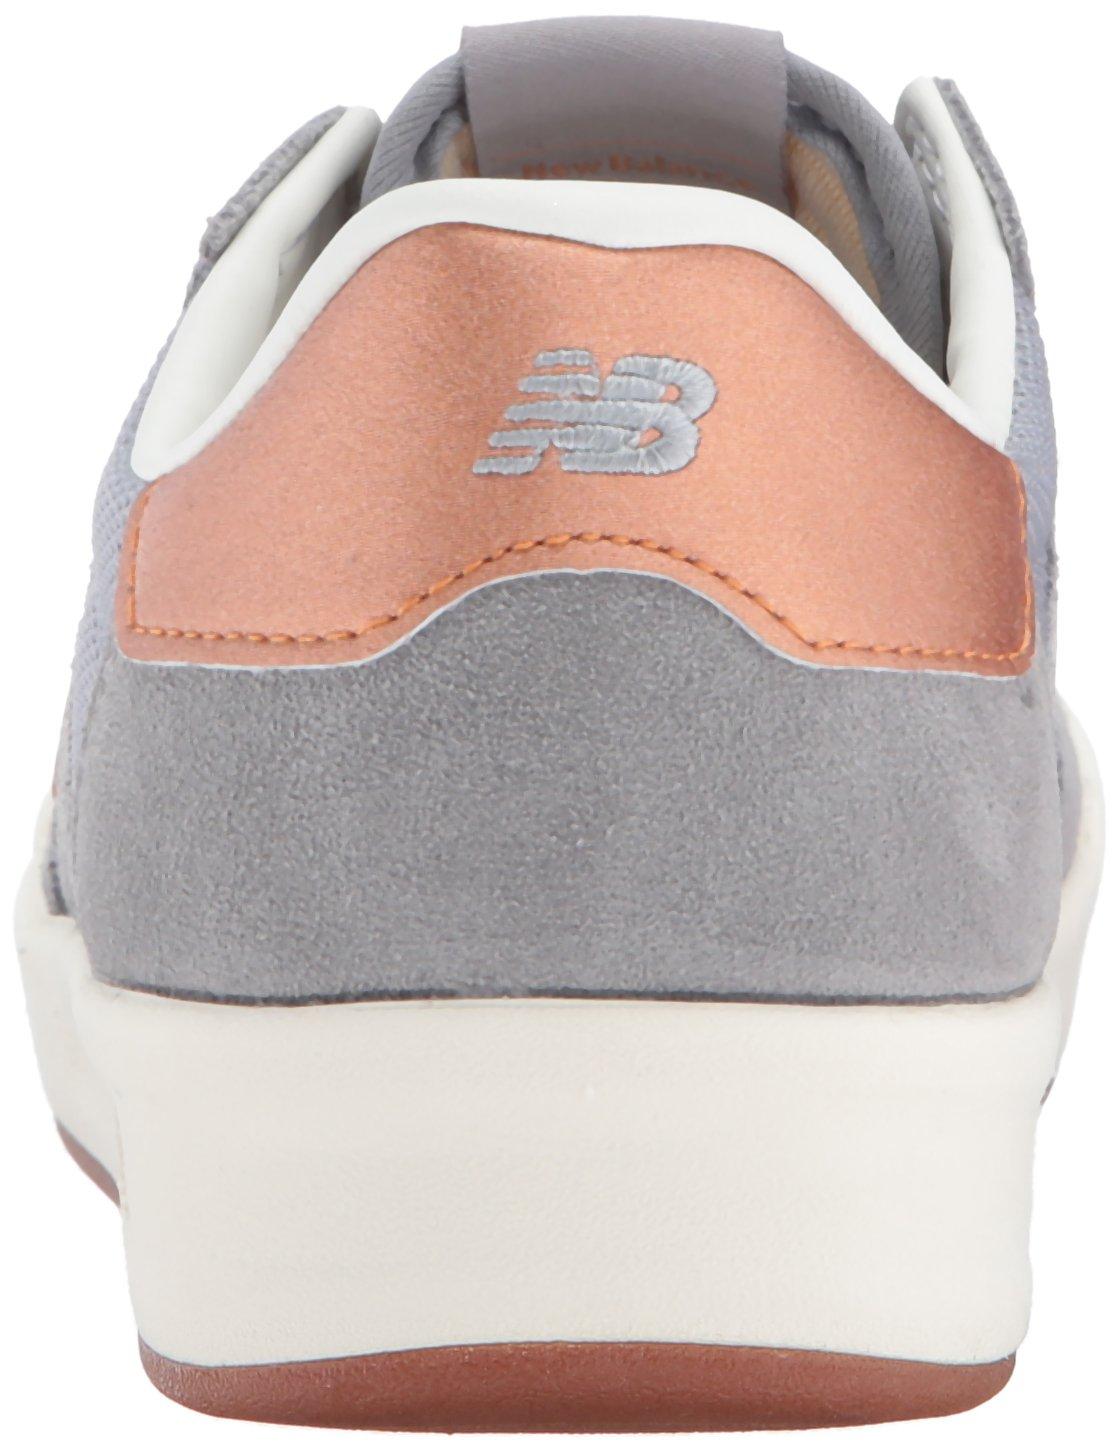 New Blau Balance Damen 300 Sneaker, Blau New Gris 24ec9c